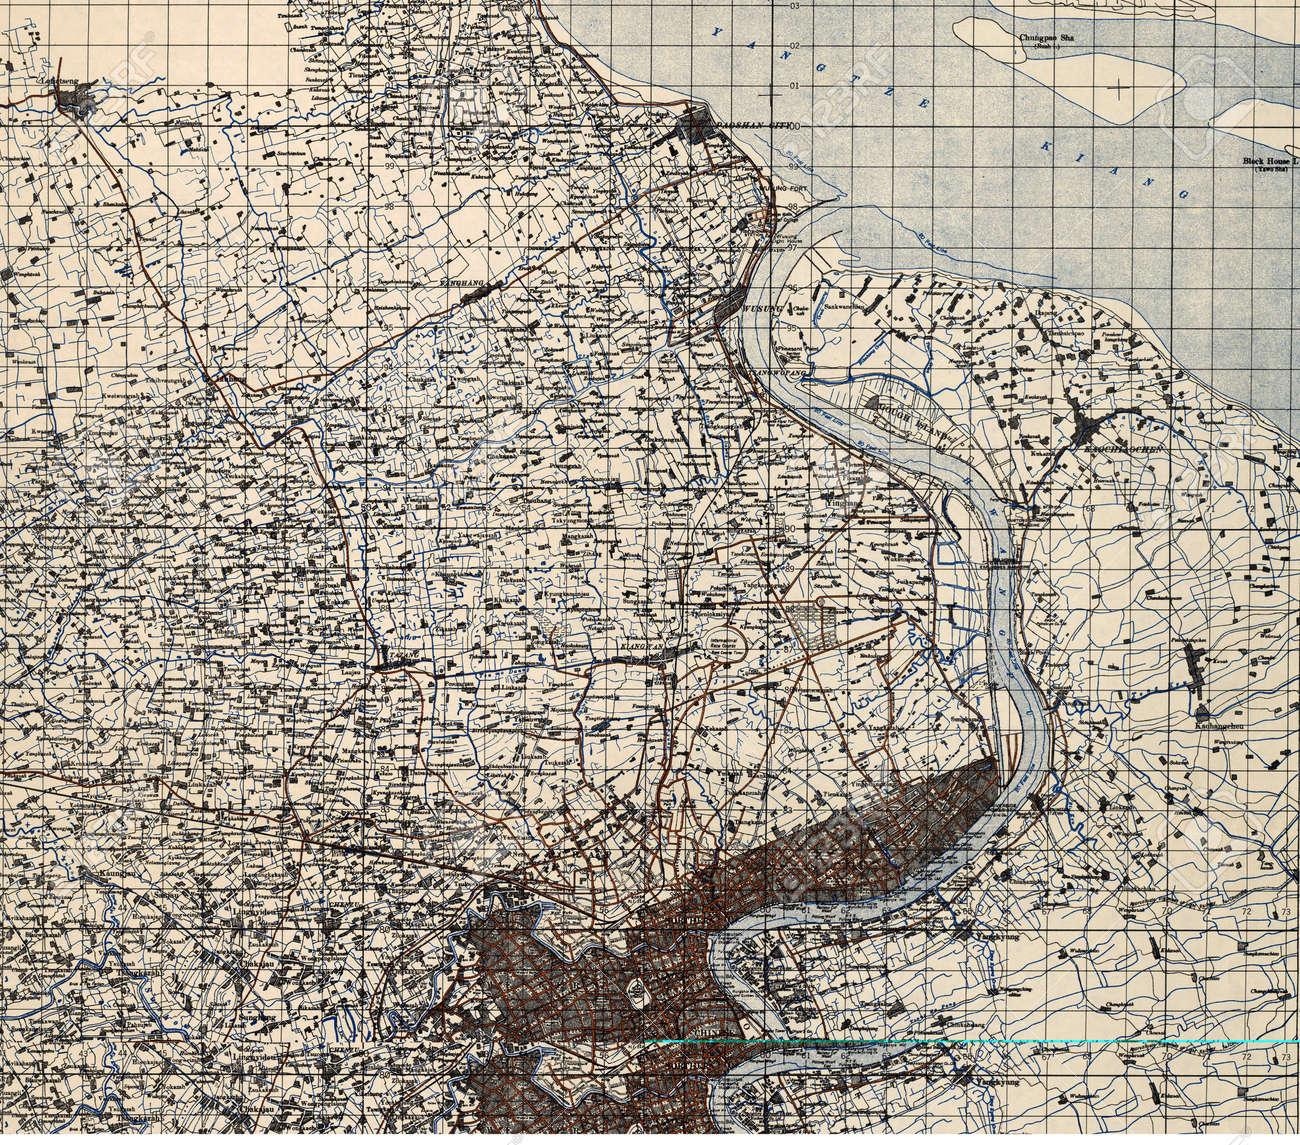 Shanghaichina world war ii military map stock photo picture and shanghaichina world war ii military map stock photo 18479429 gumiabroncs Images